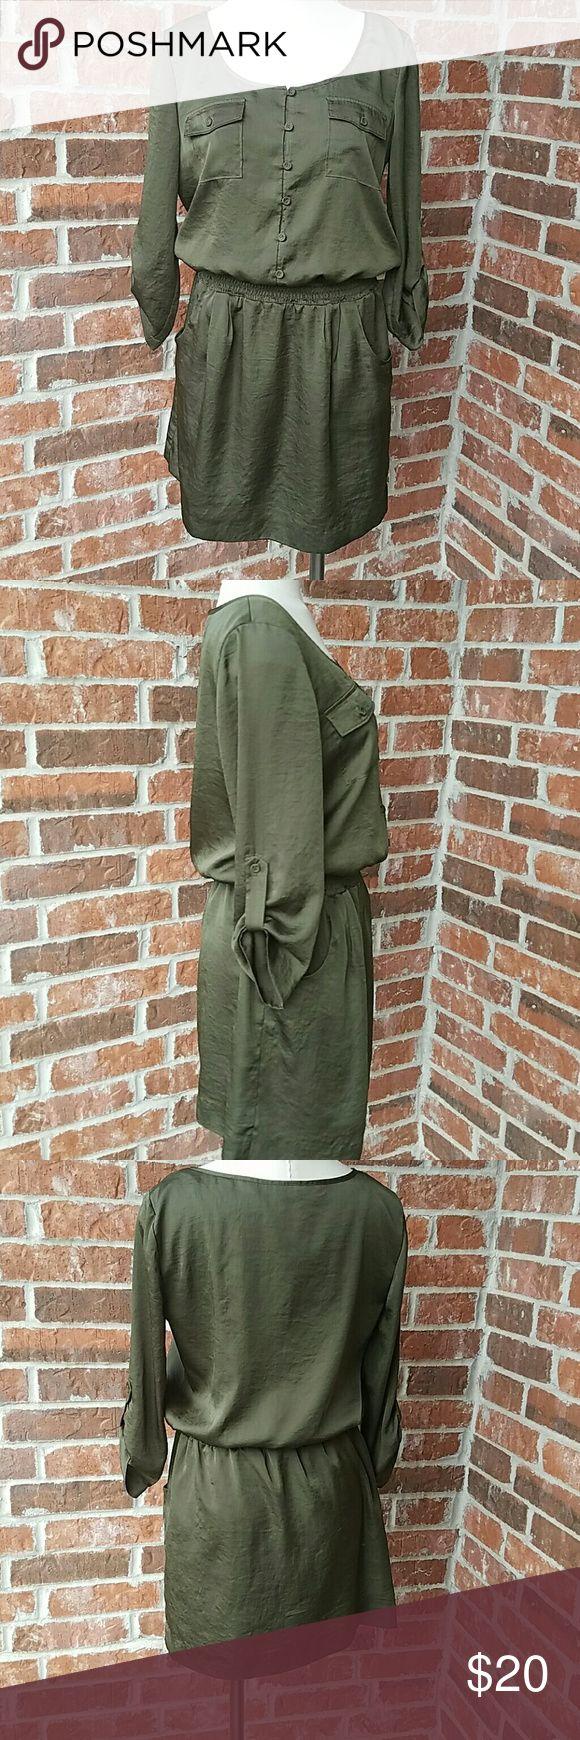 Gianni Bini dress Olive green excellent condition Gianni Bini Dresses